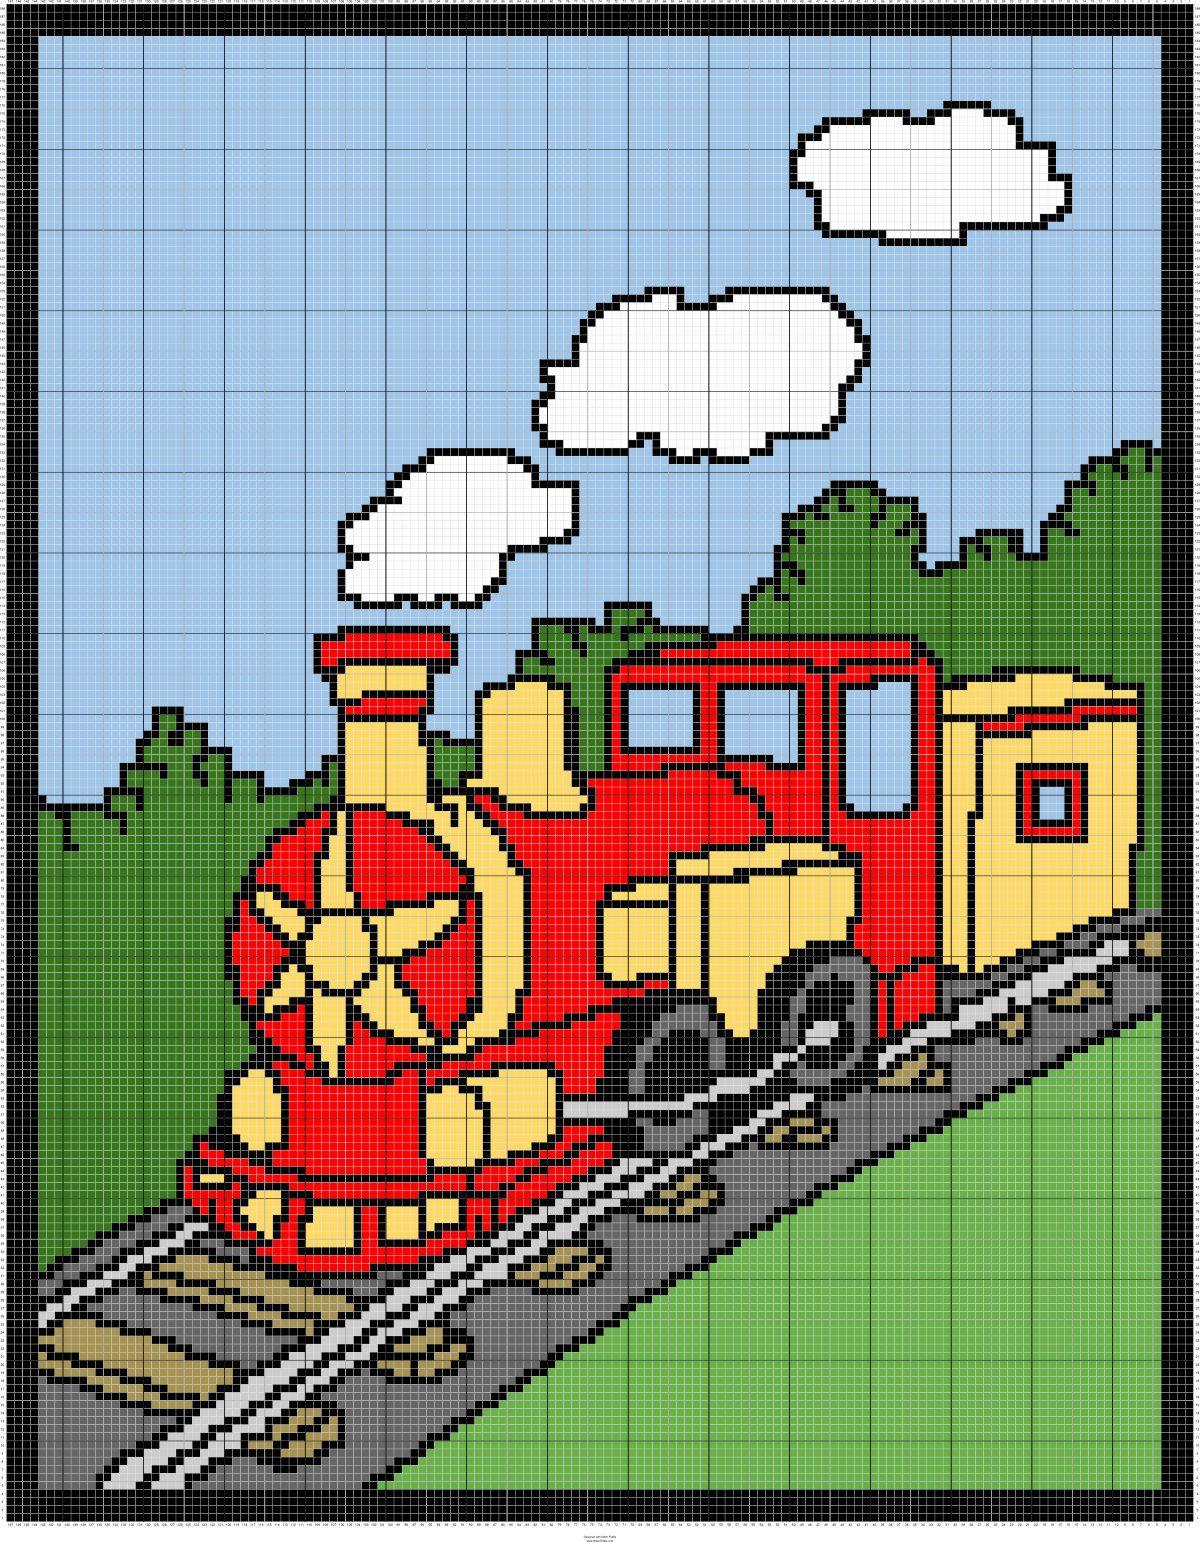 Choo Choo Train Graph Pattern With Row By Row Counts